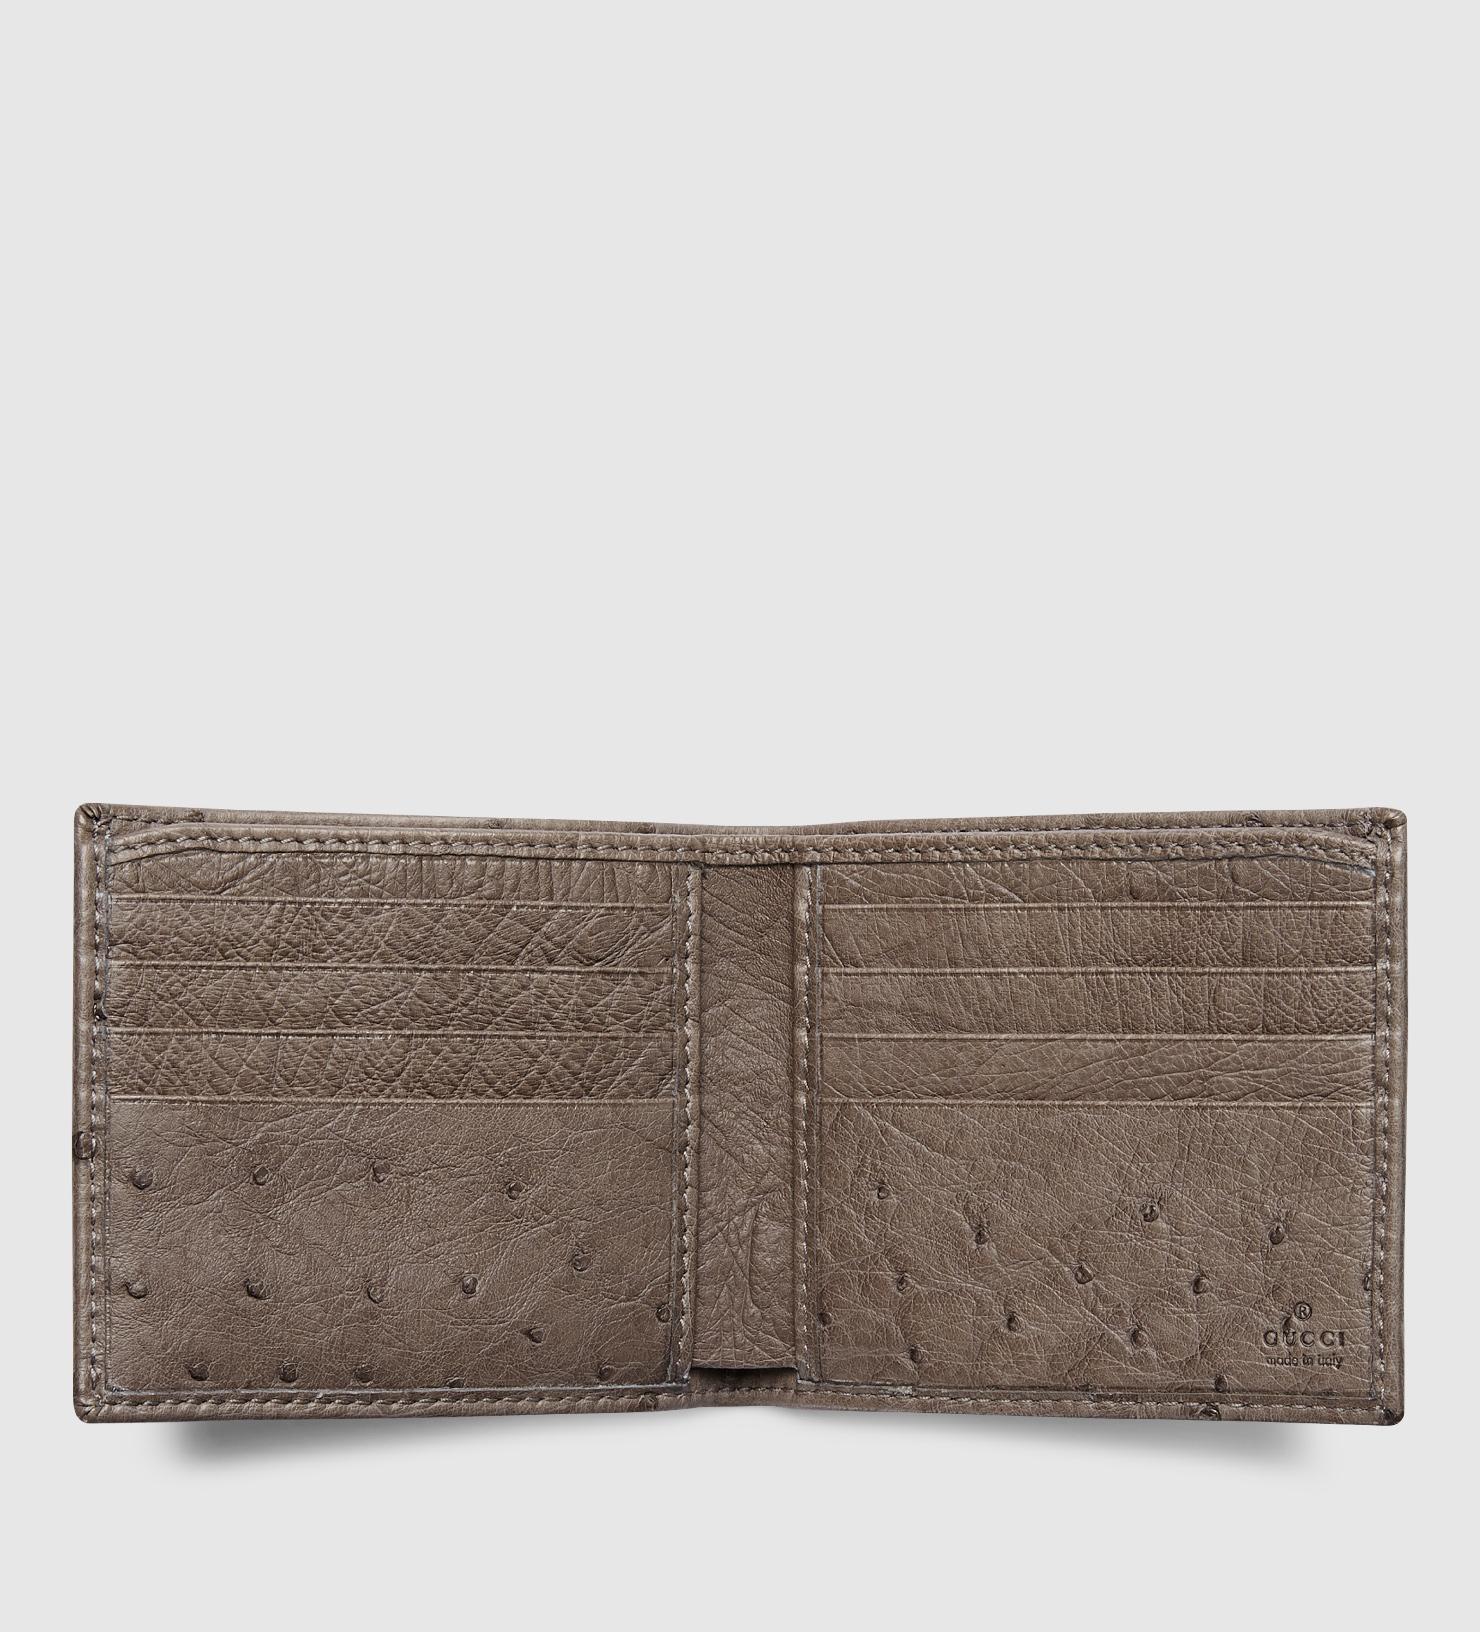 822ddd93508 Gucci Ostrich Bi-fold Wallet in Brown for Men - Lyst